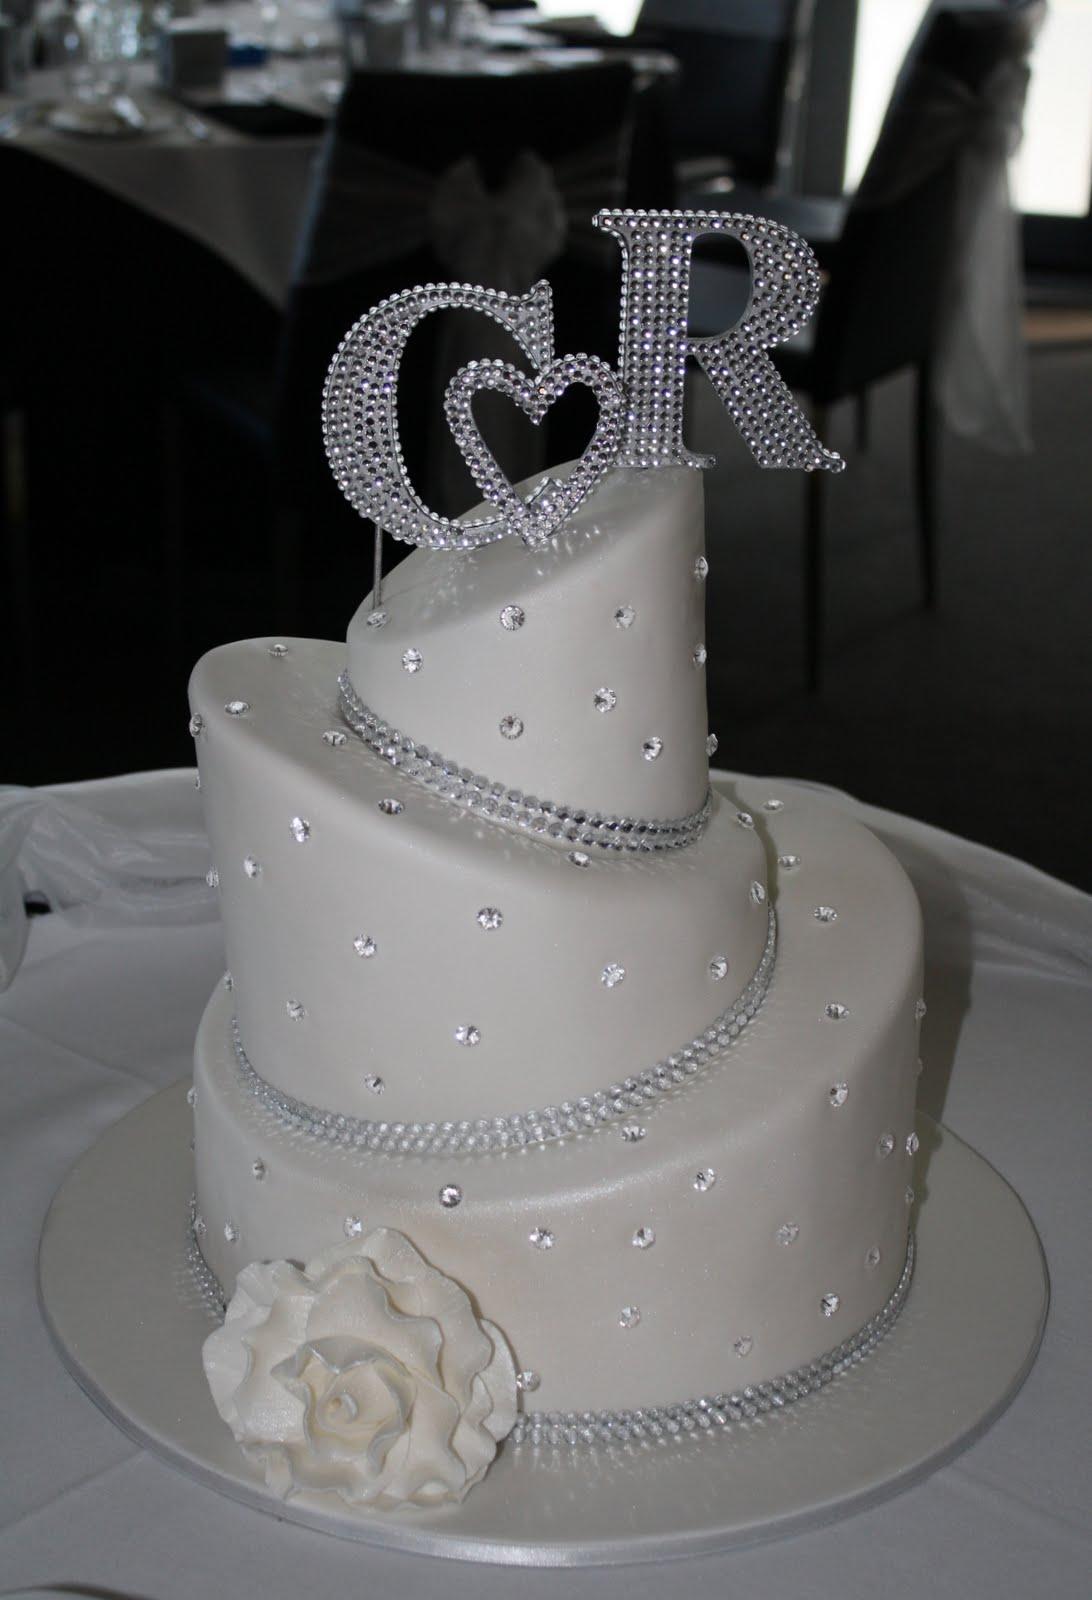 Sandy s Cakes Craig & Rachel s Blingy Wedding Cake just